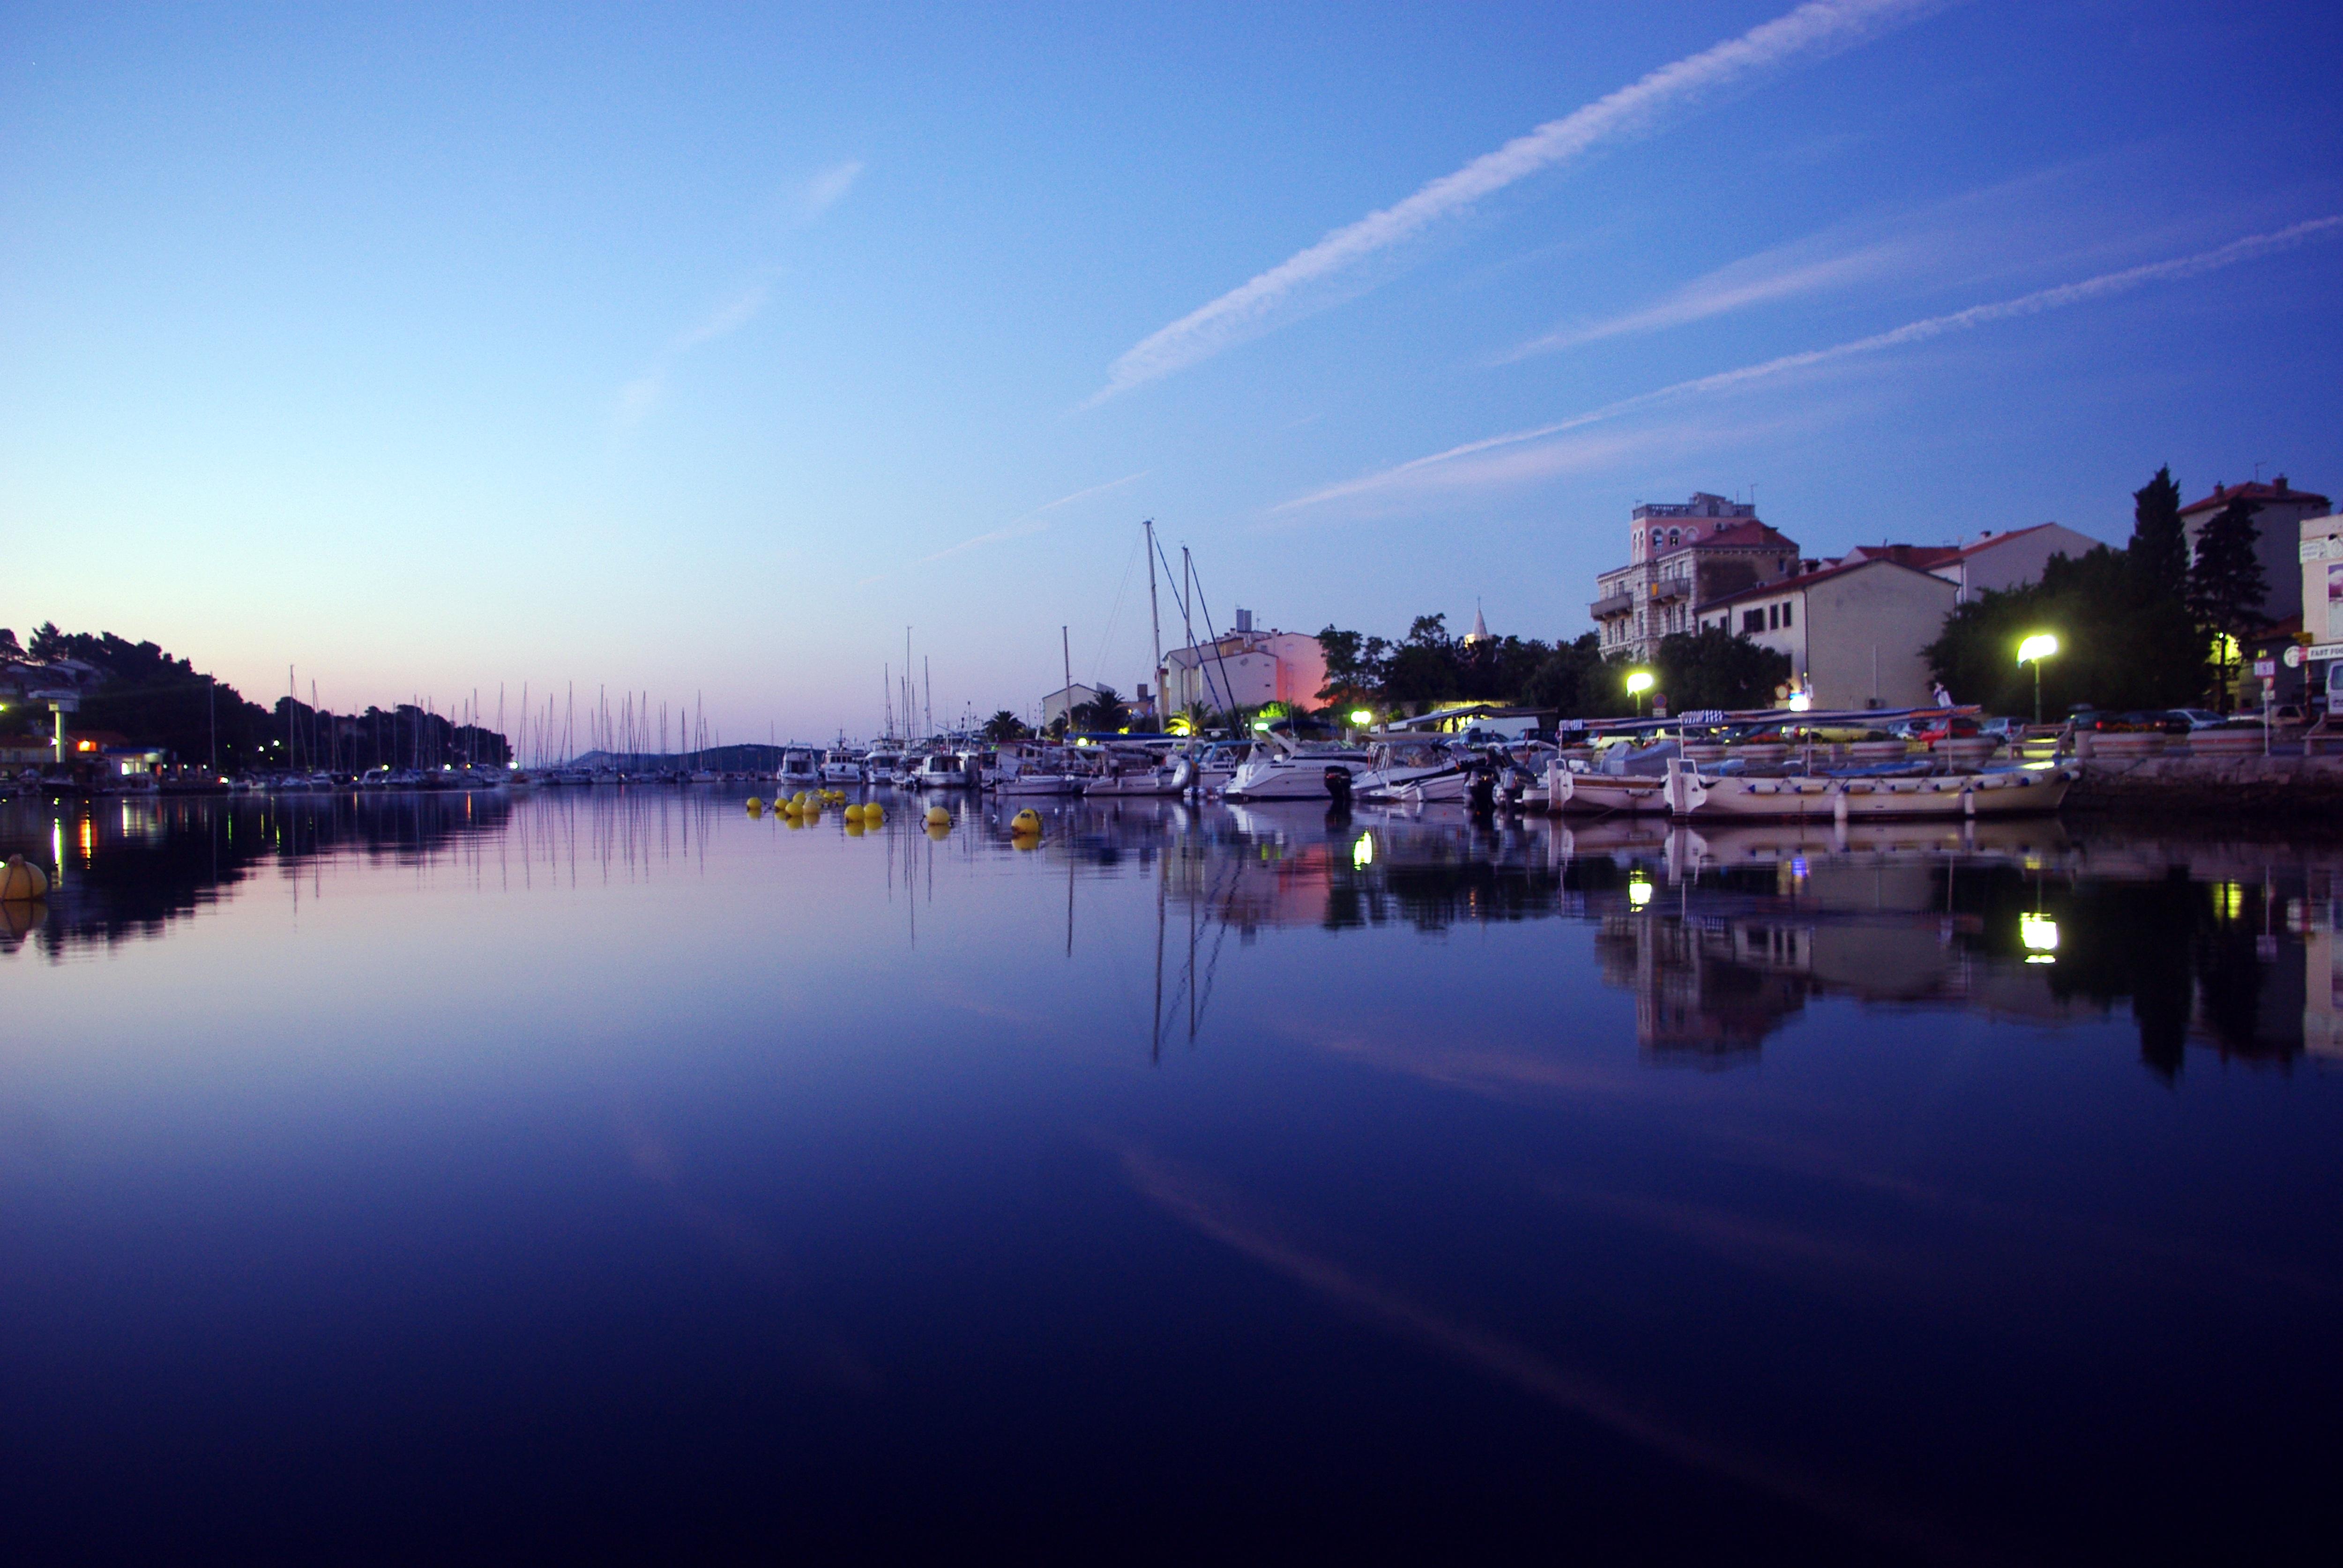 Sea, Boats, Construction, House, River, HQ Photo